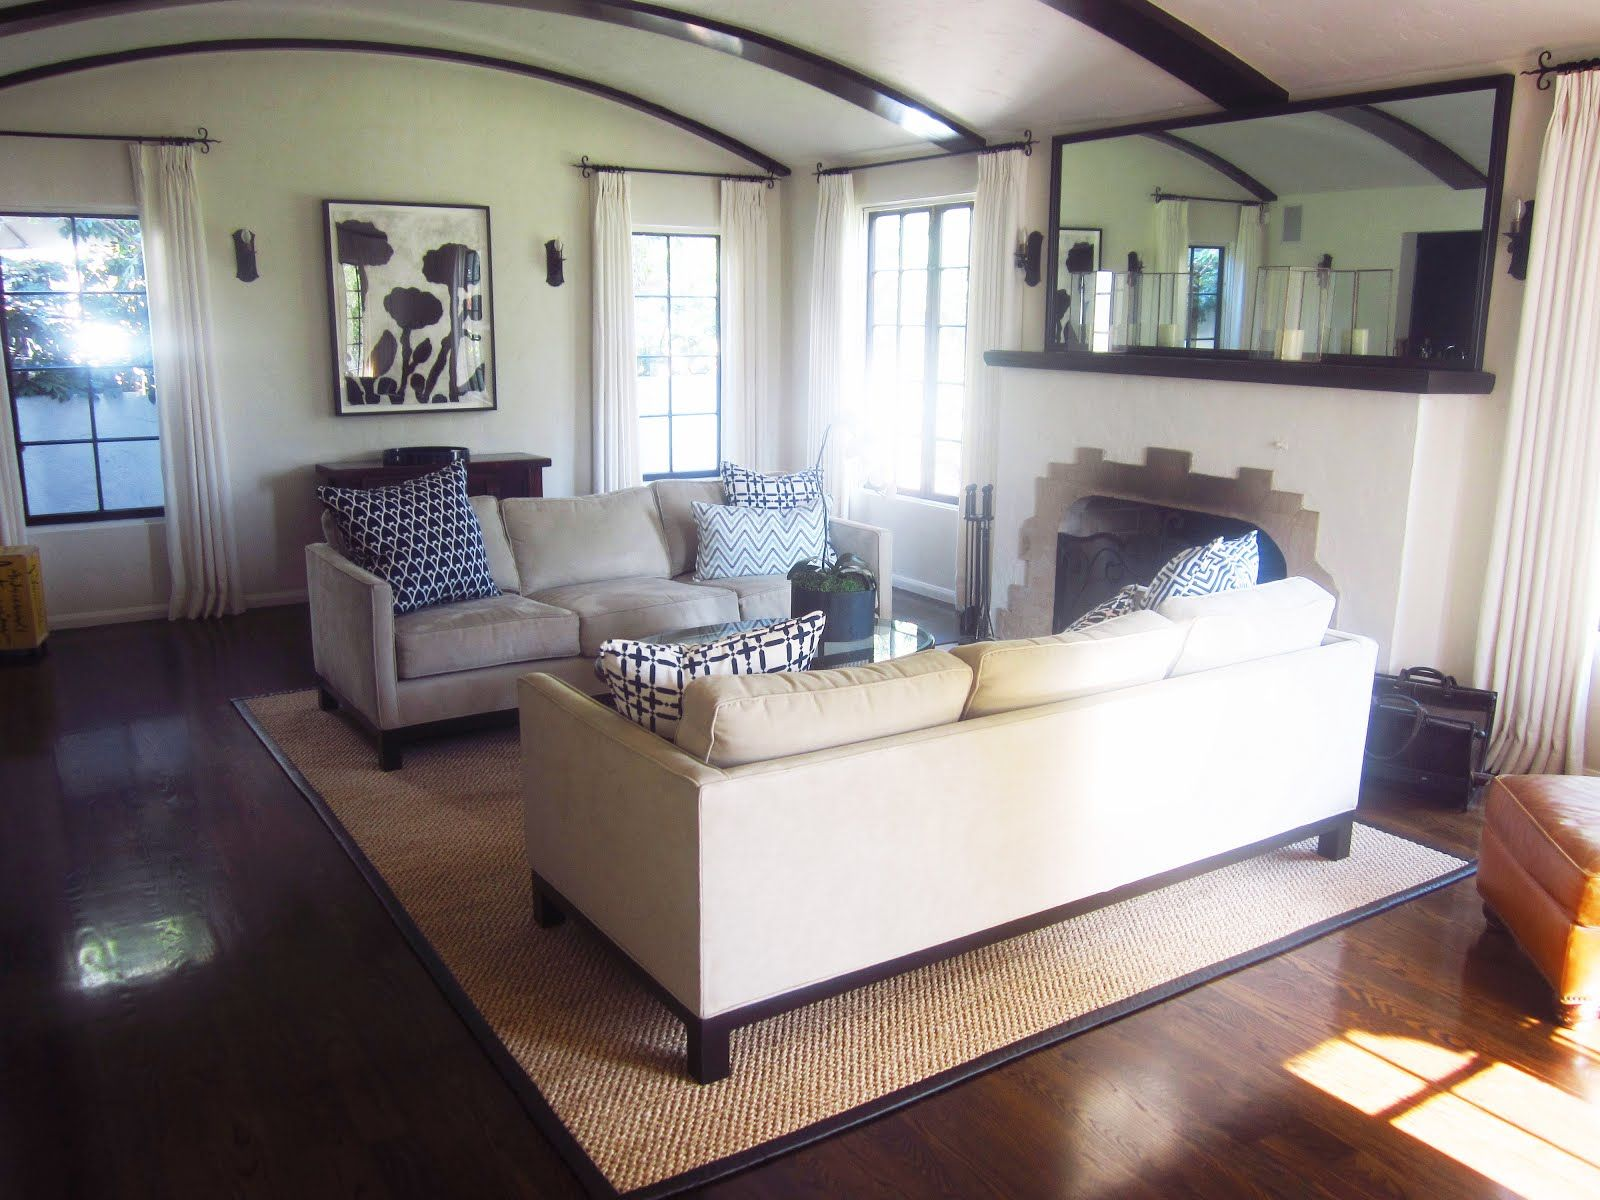 Exclusive simply elegant california living room also best koltuk takimlari images on pinterest home decor rh